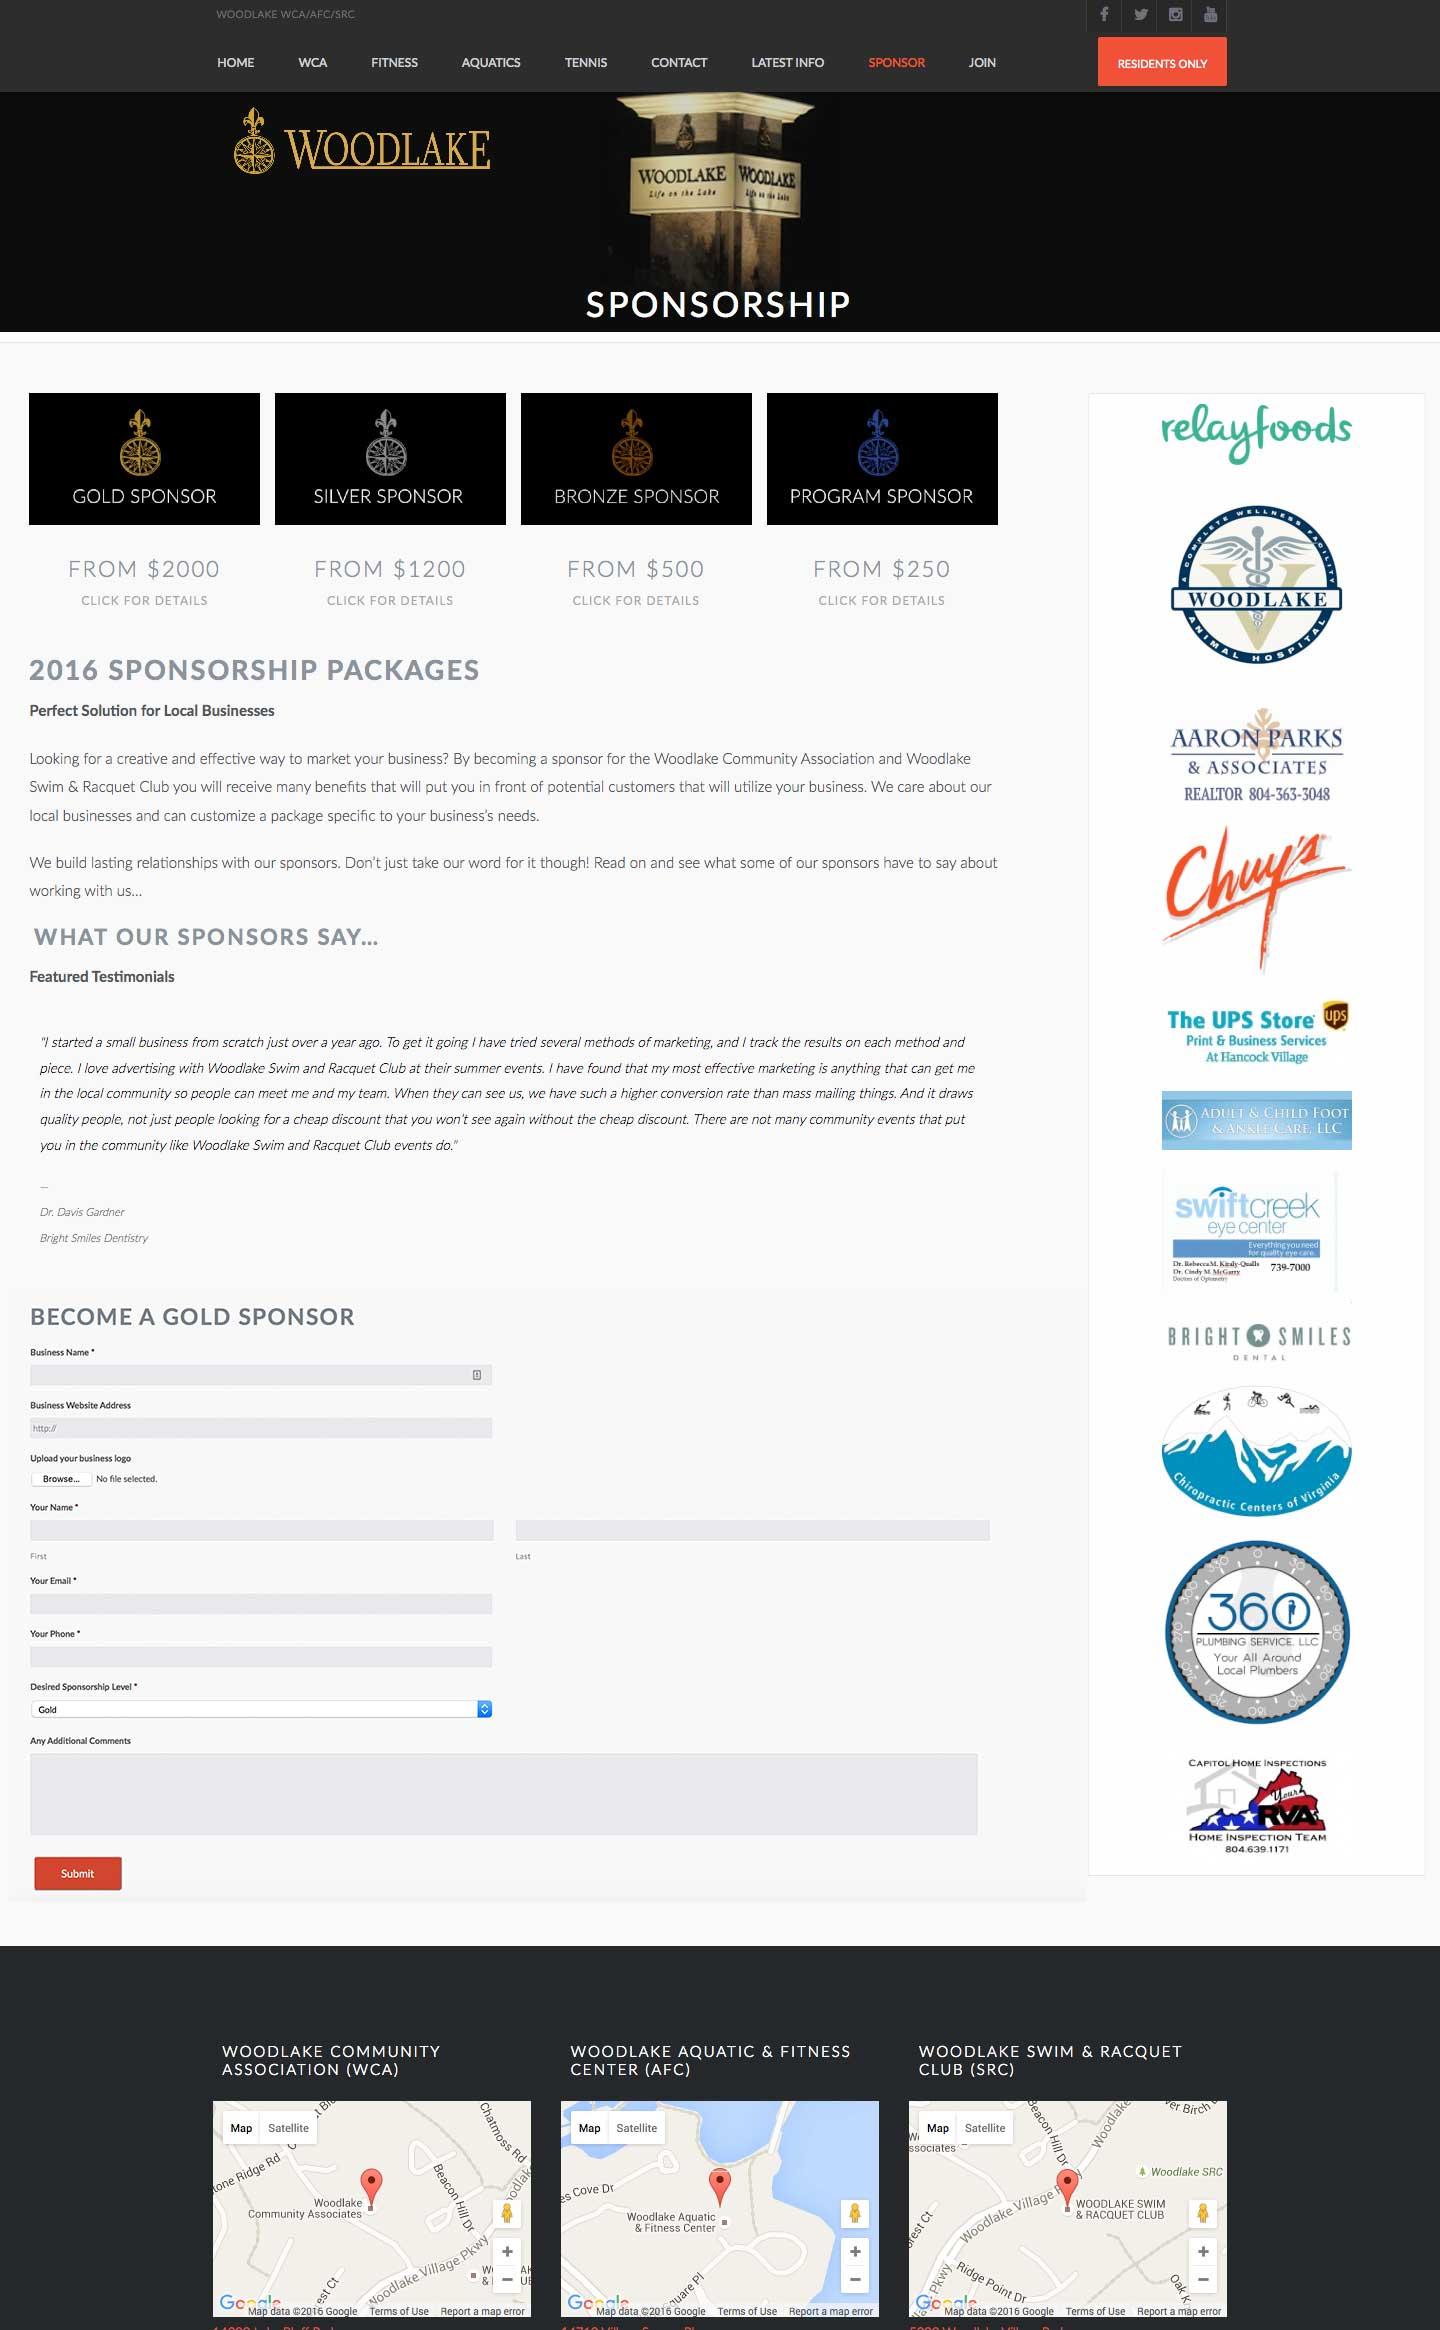 122-woodlake-sponsors